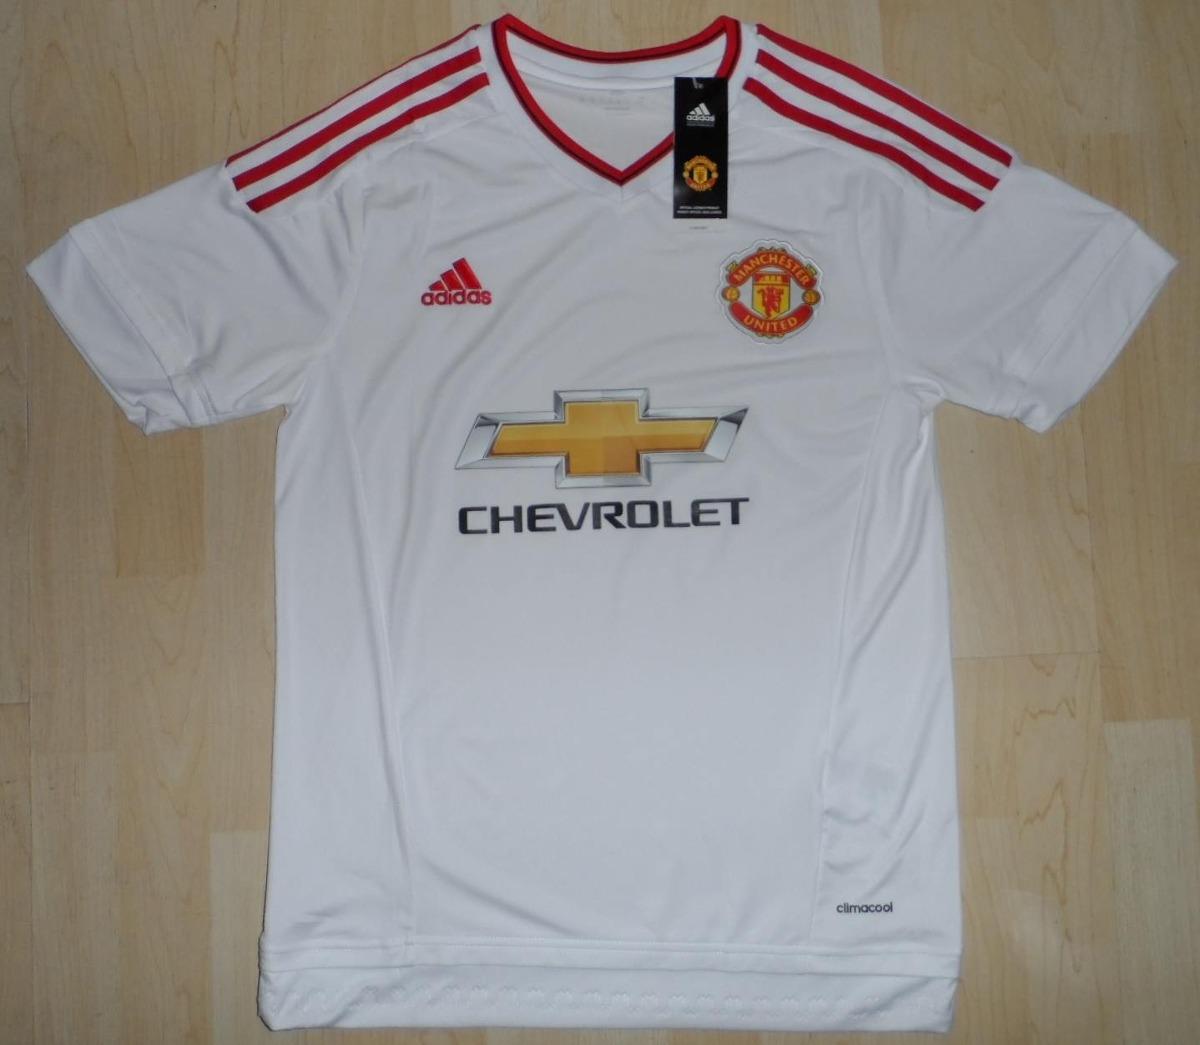 a2f373da3b0bf camiseta de futbol manchester united visitante promo. Cargando zoom.